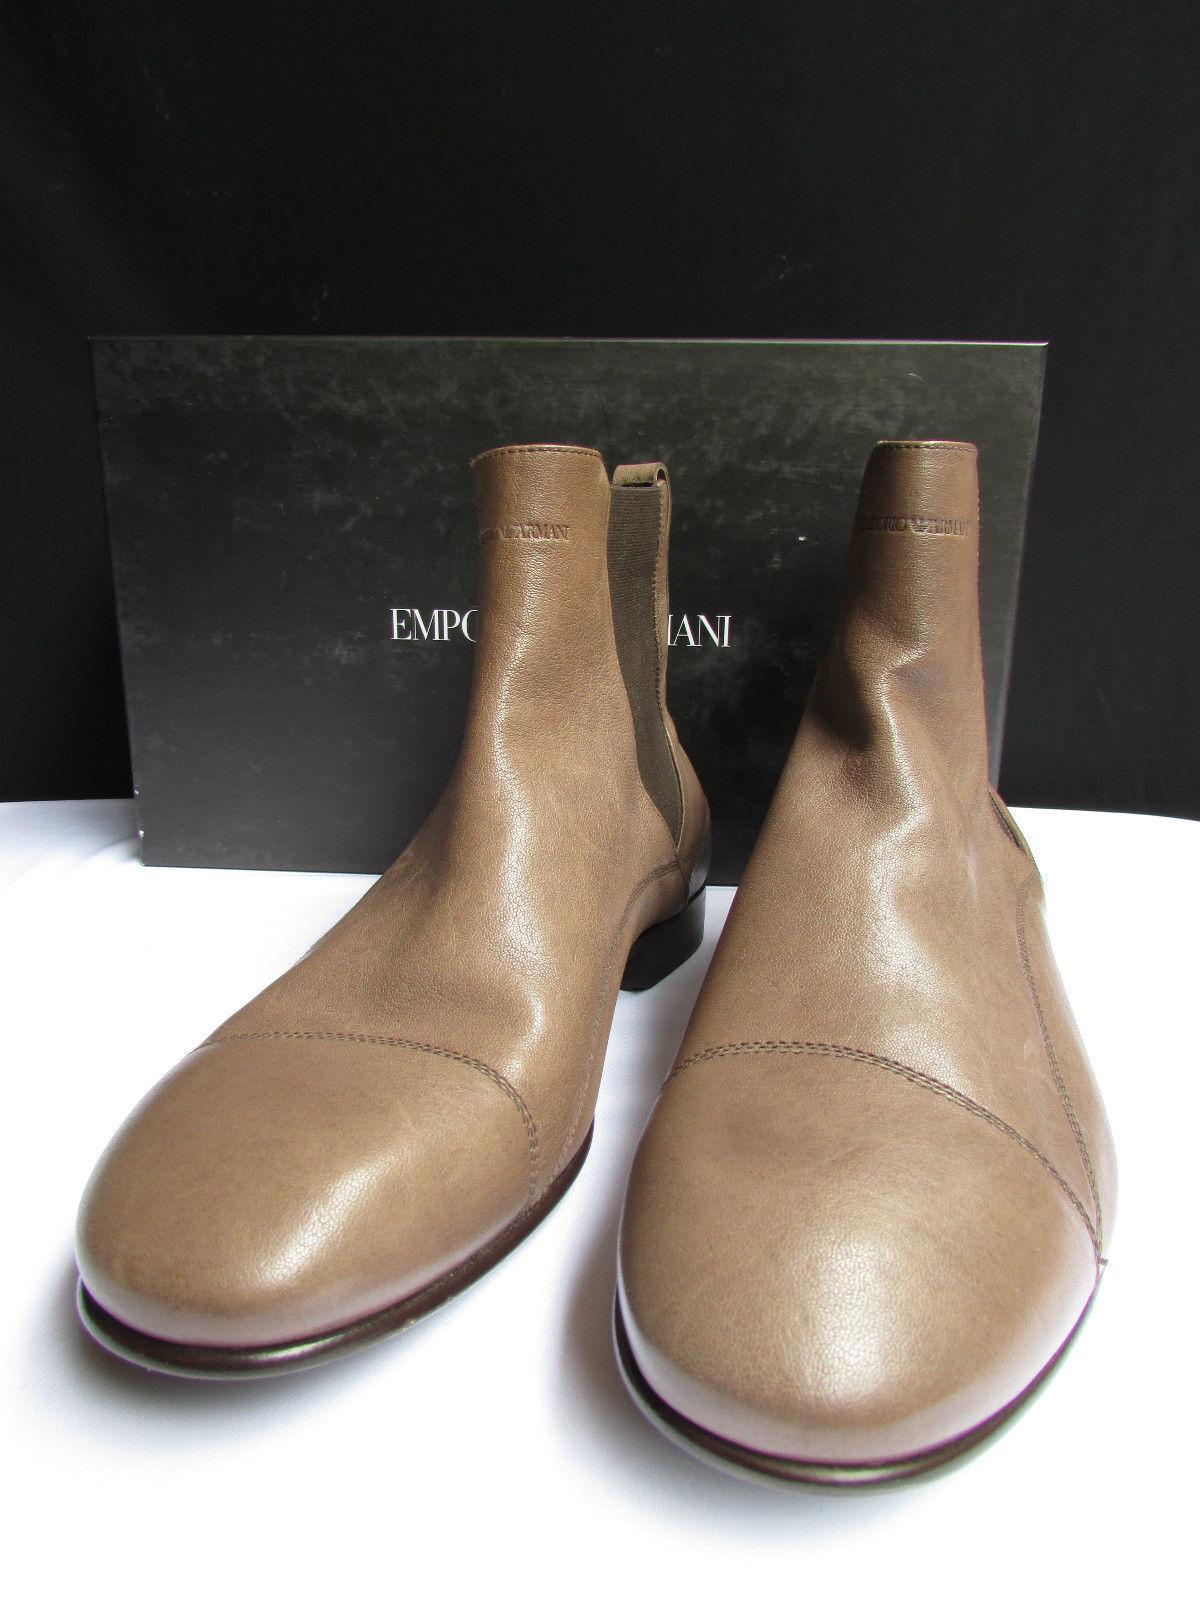 Neu Emporio Armani Herren Stiefel Hell Braune Schuhe Leder Elegant Mode 40 - 6.5